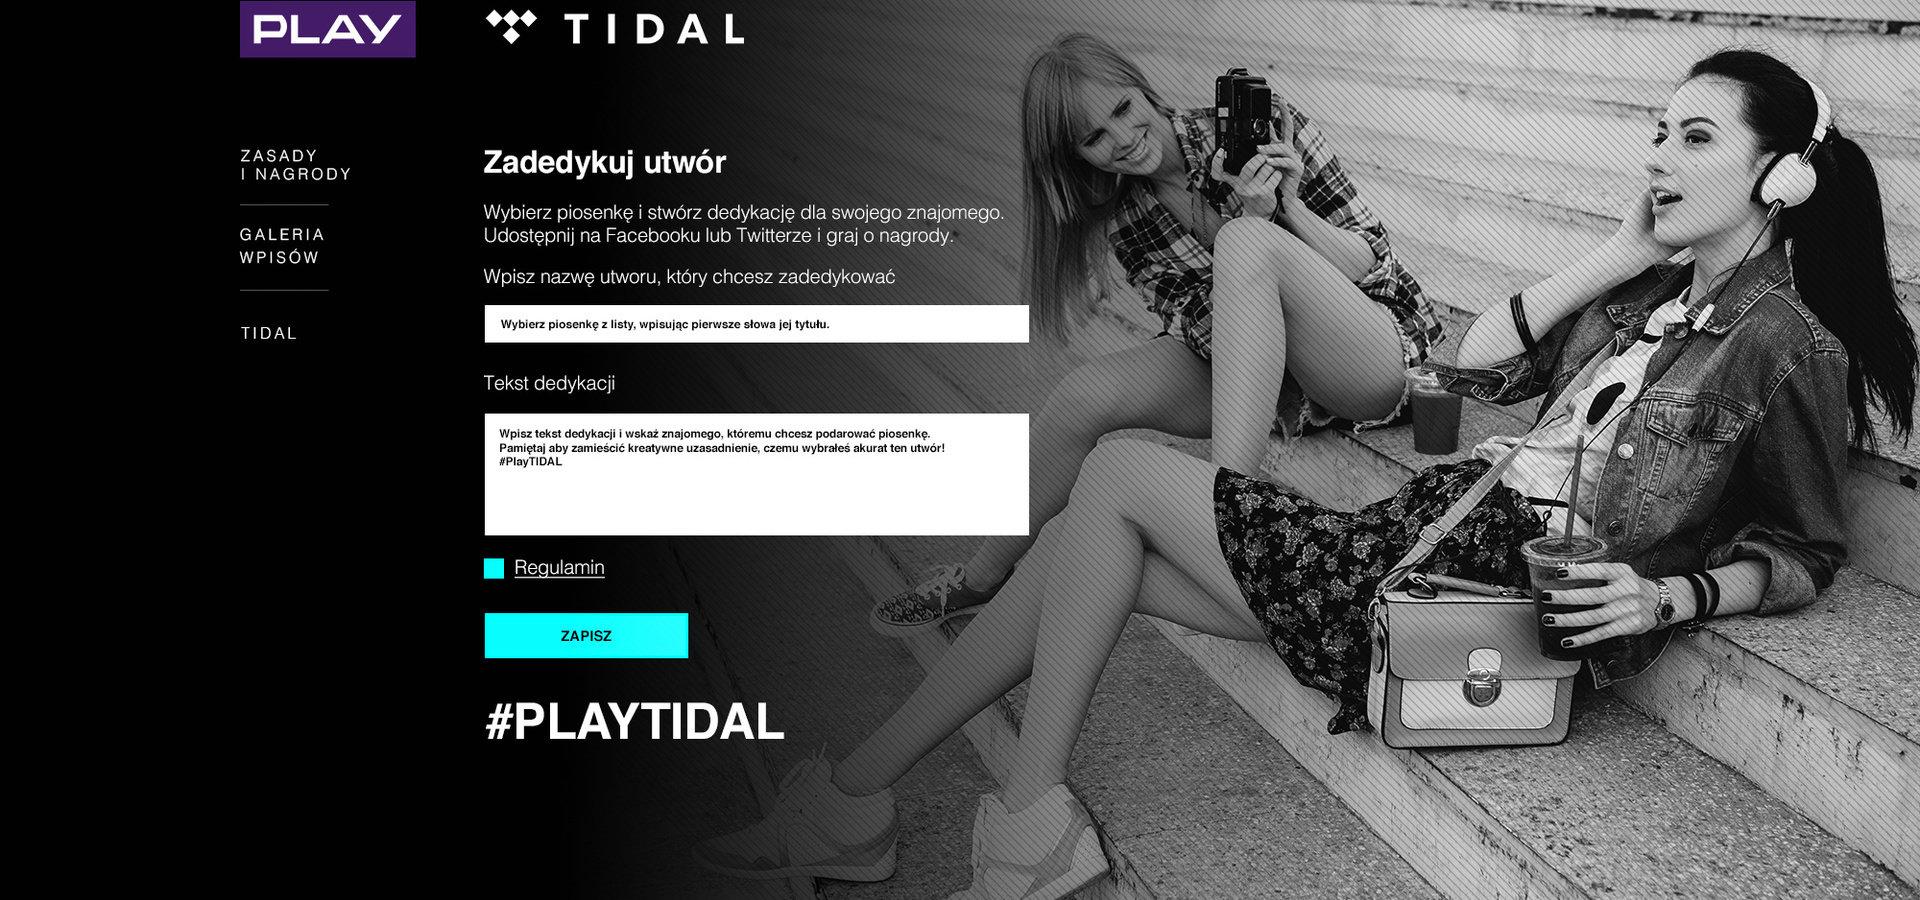 #PlayTidal